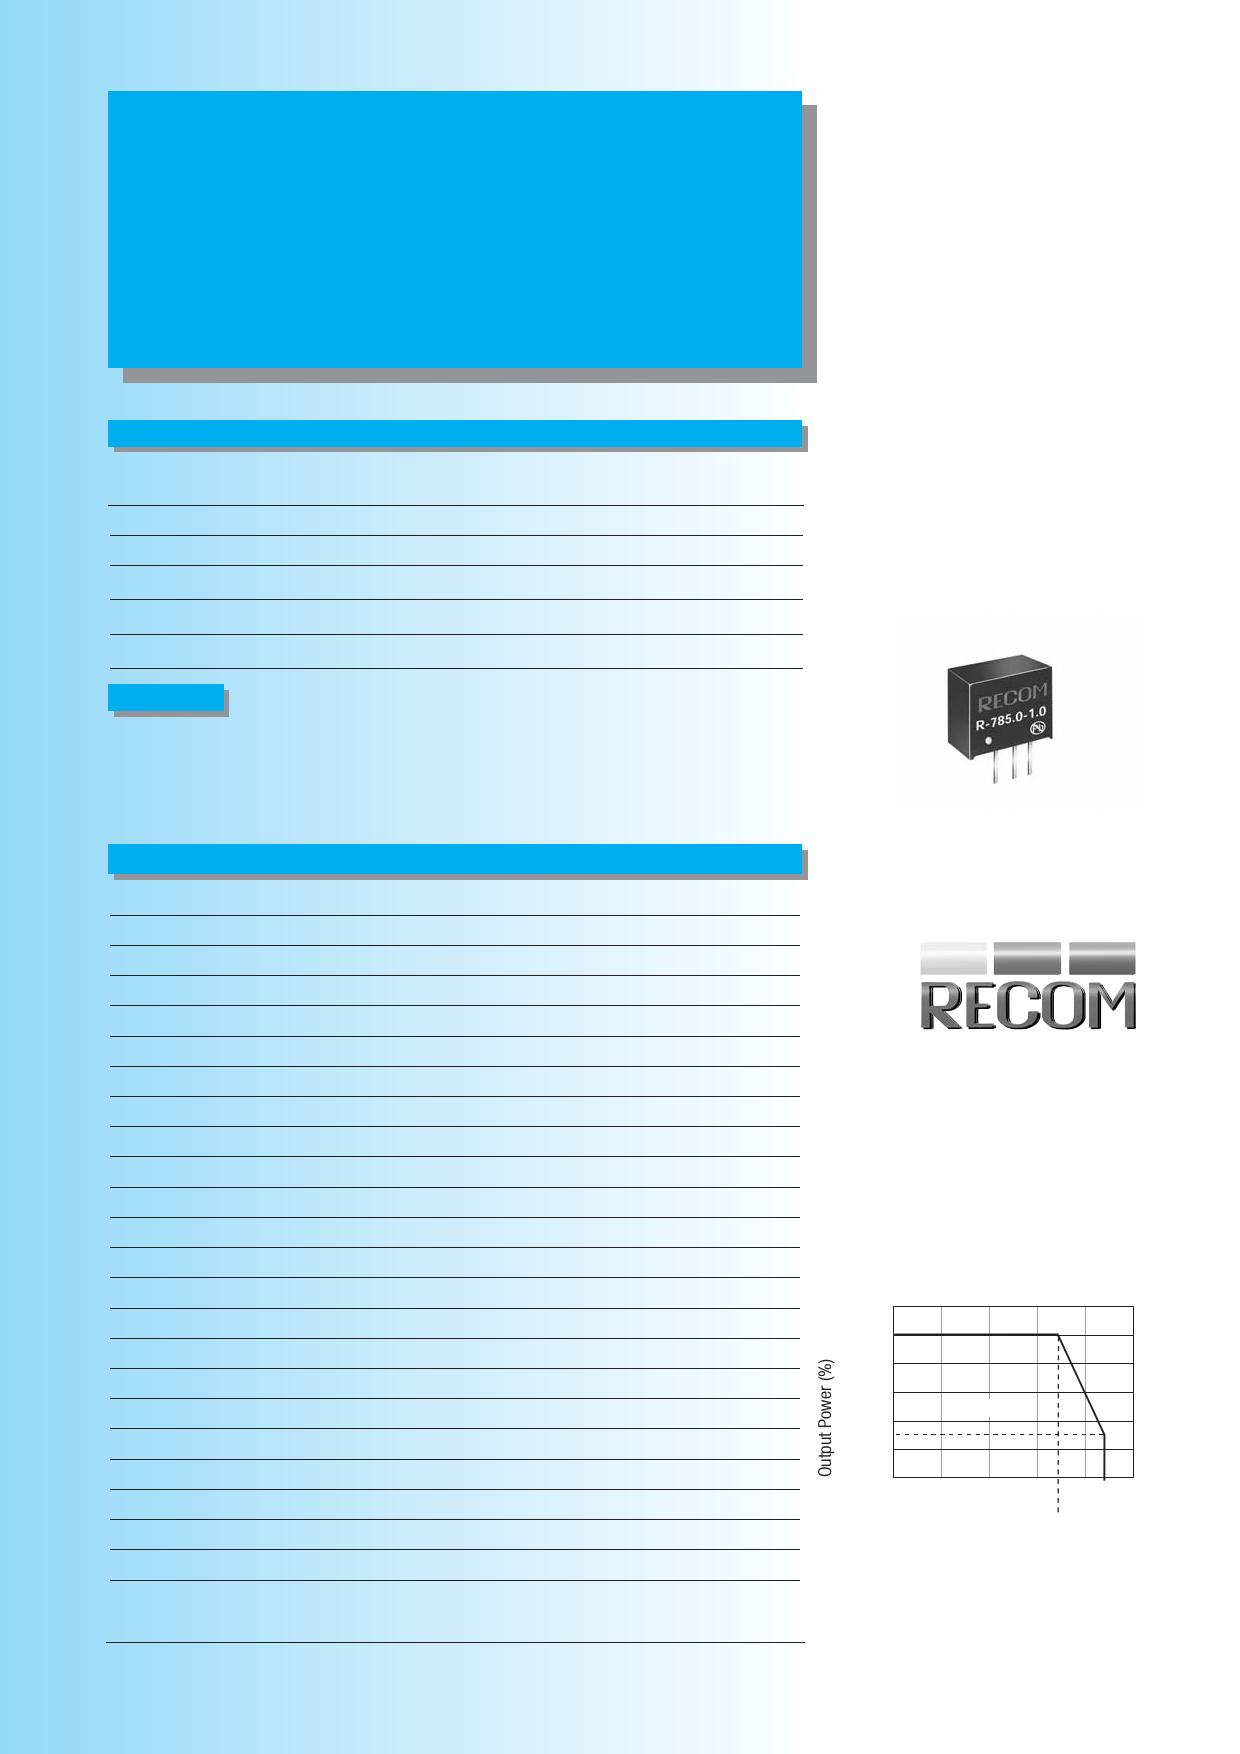 R-785.0-1.0 datasheet